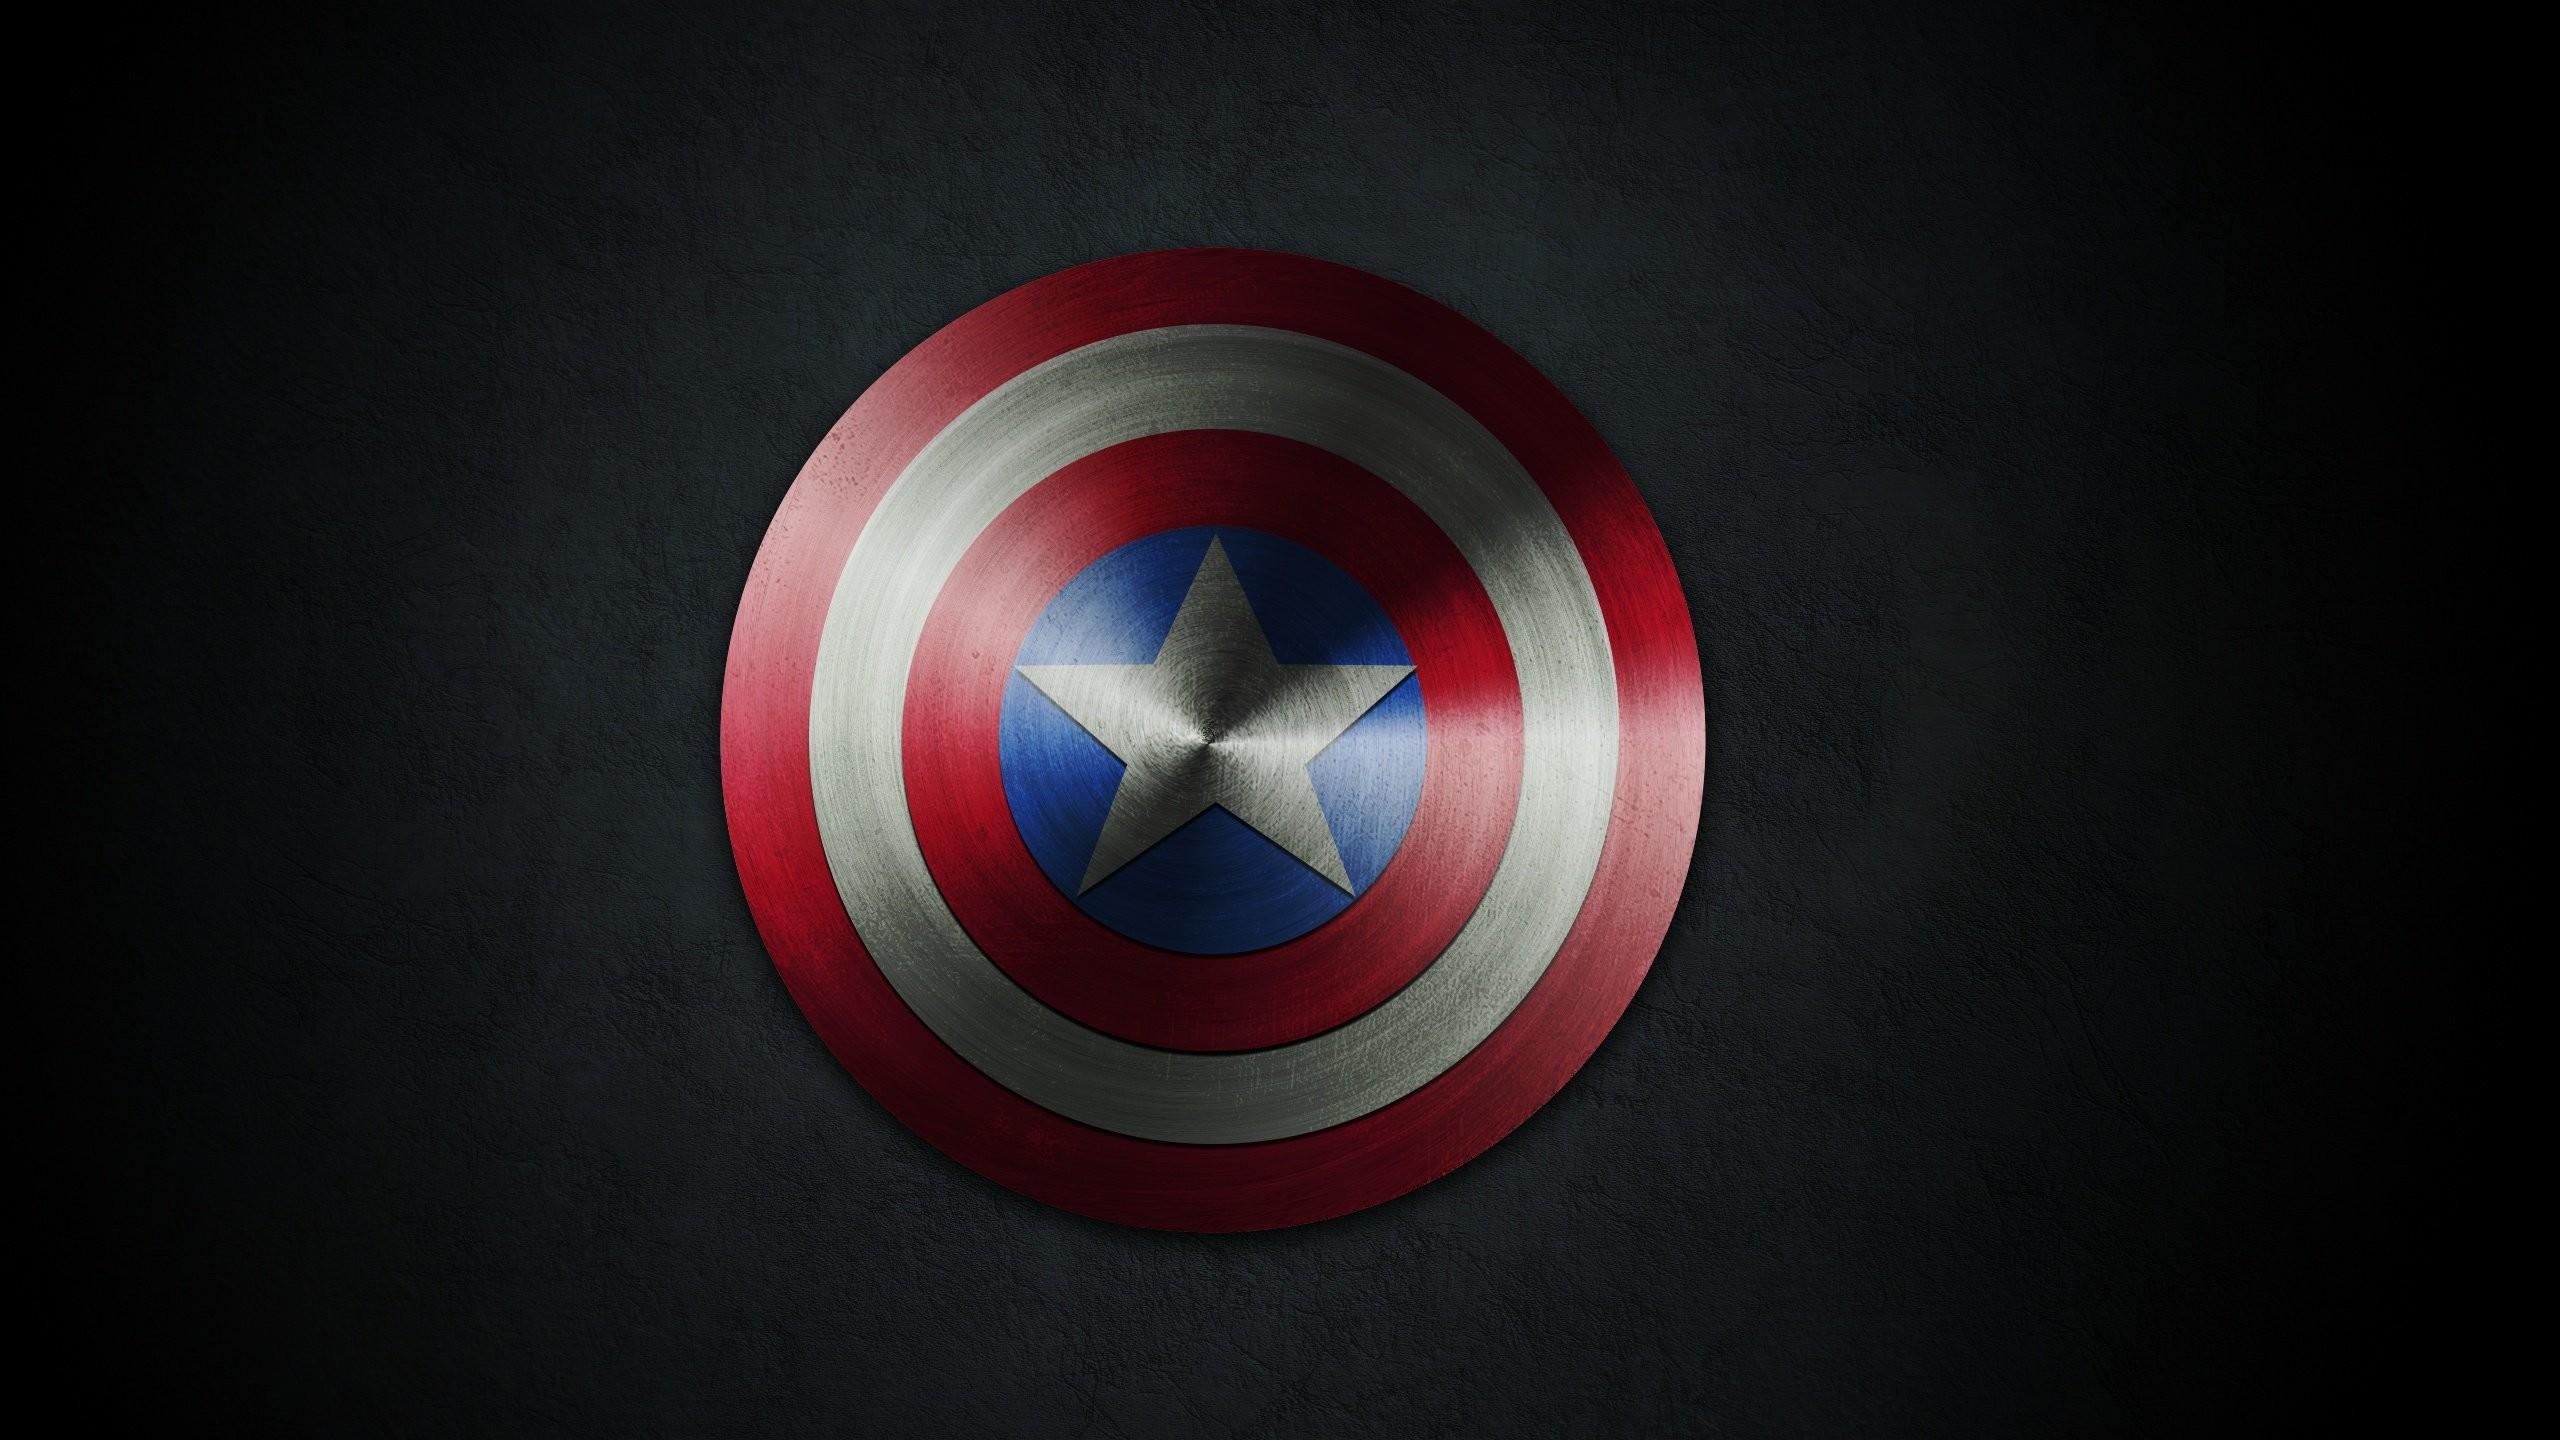 Captain America Shield Wallpapers HD Logo Brands Wallpaper